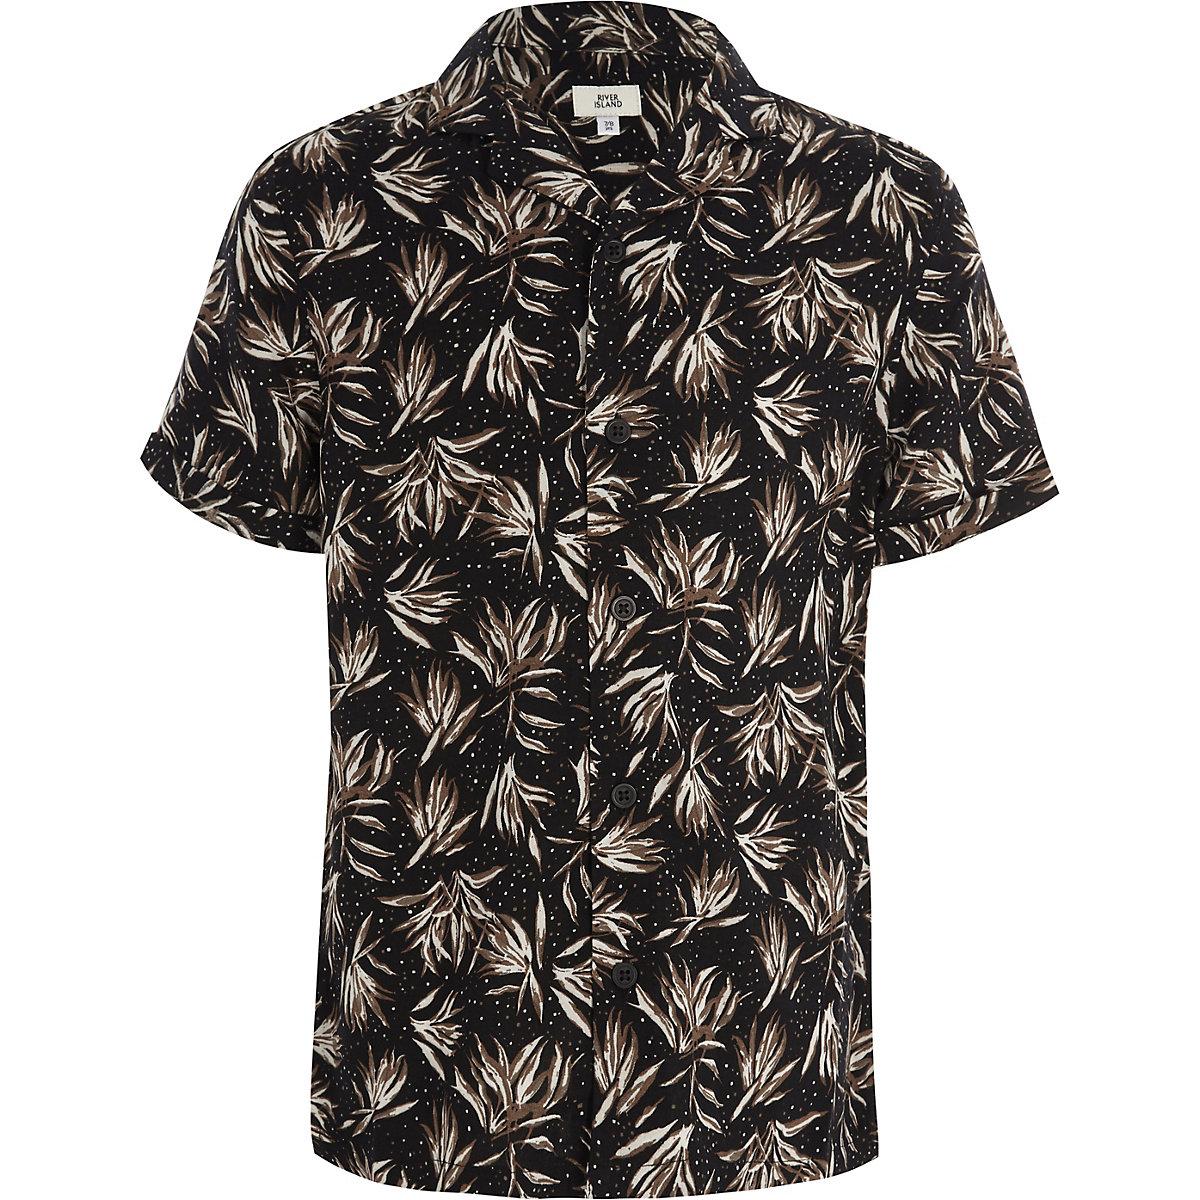 Schwarzes Kurzarmhemd mit Federprint